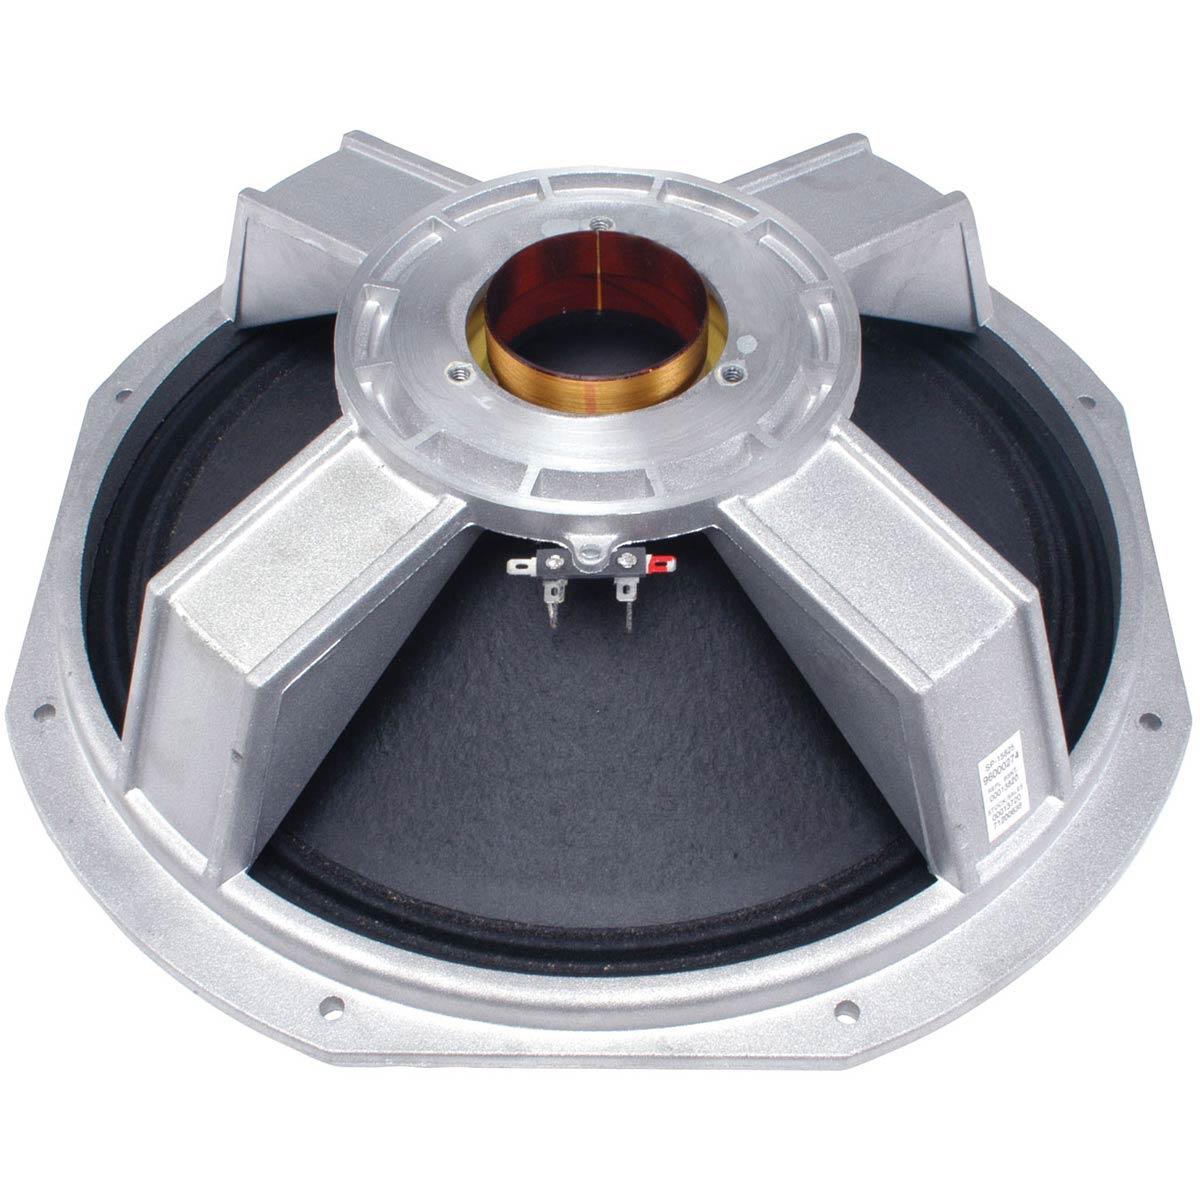 peavey replacement repair parts speakers and accessories rh simplyspeakers com